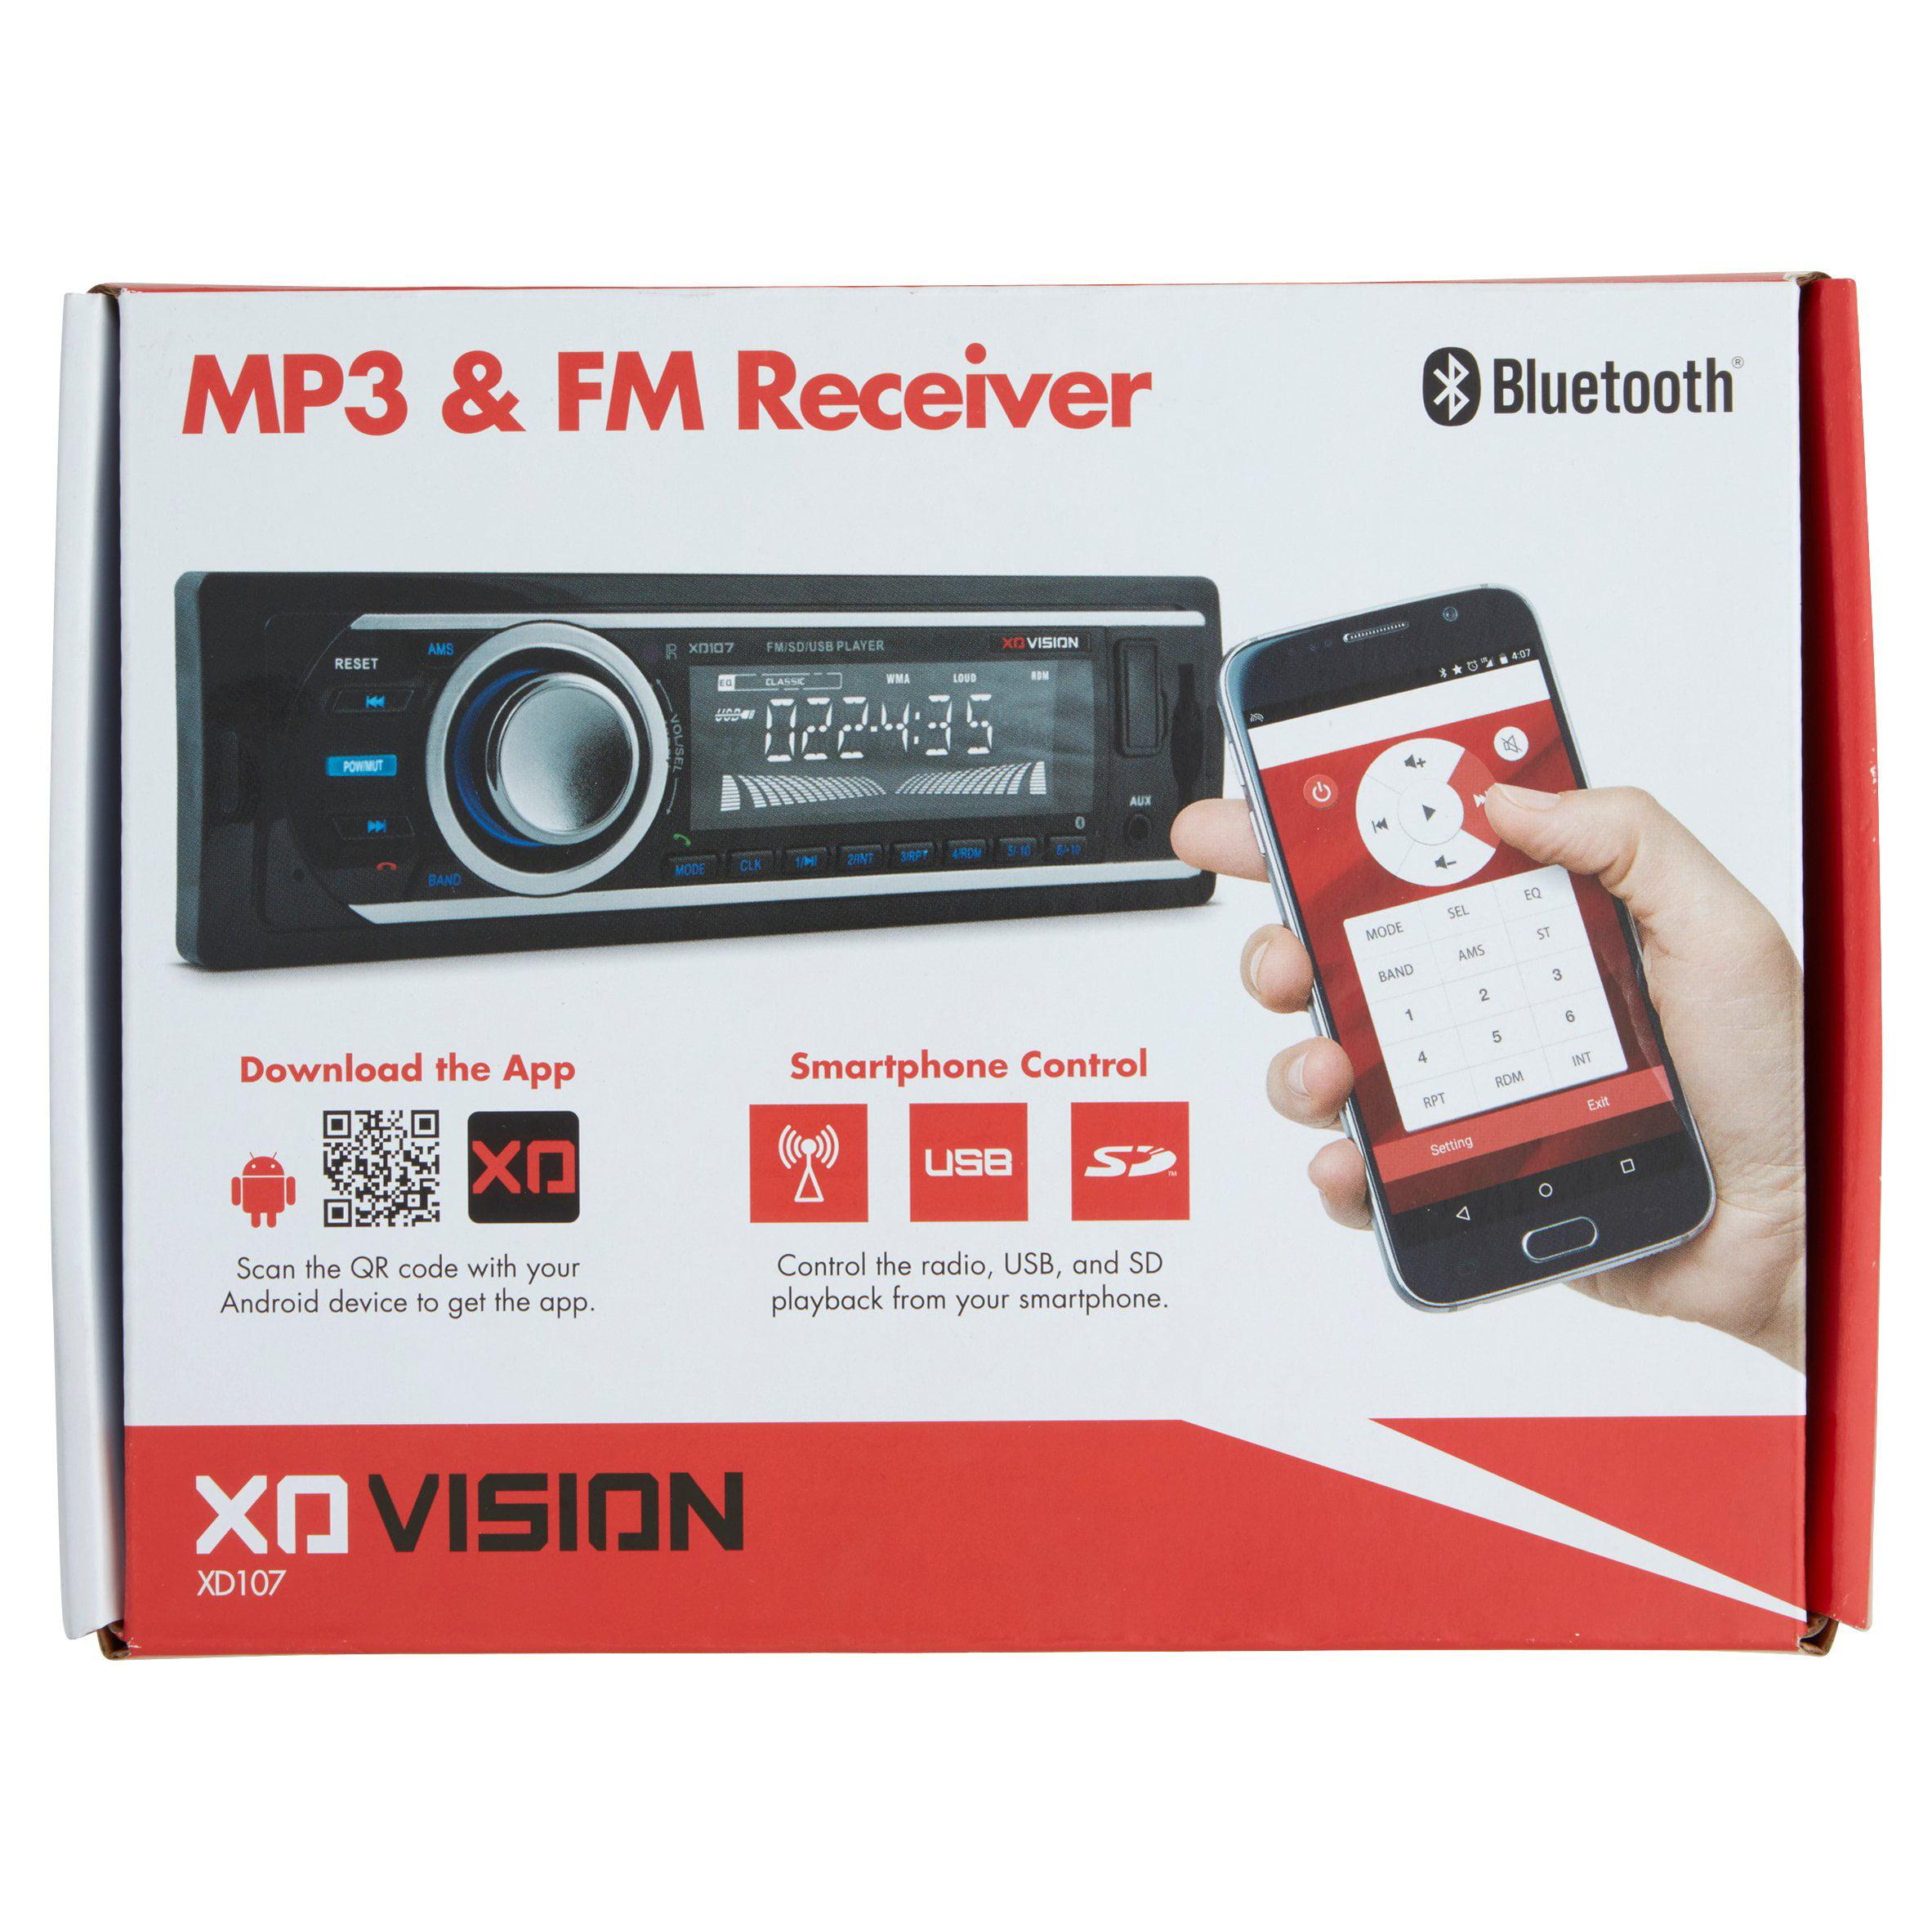 ccfb70b7 f2b6 420e bea8 573376b1b21c_1.f043c1c3b66b57fd9e89ebe67154bc78 xo vision single din in dash fm mp3 digital media receiver with usb